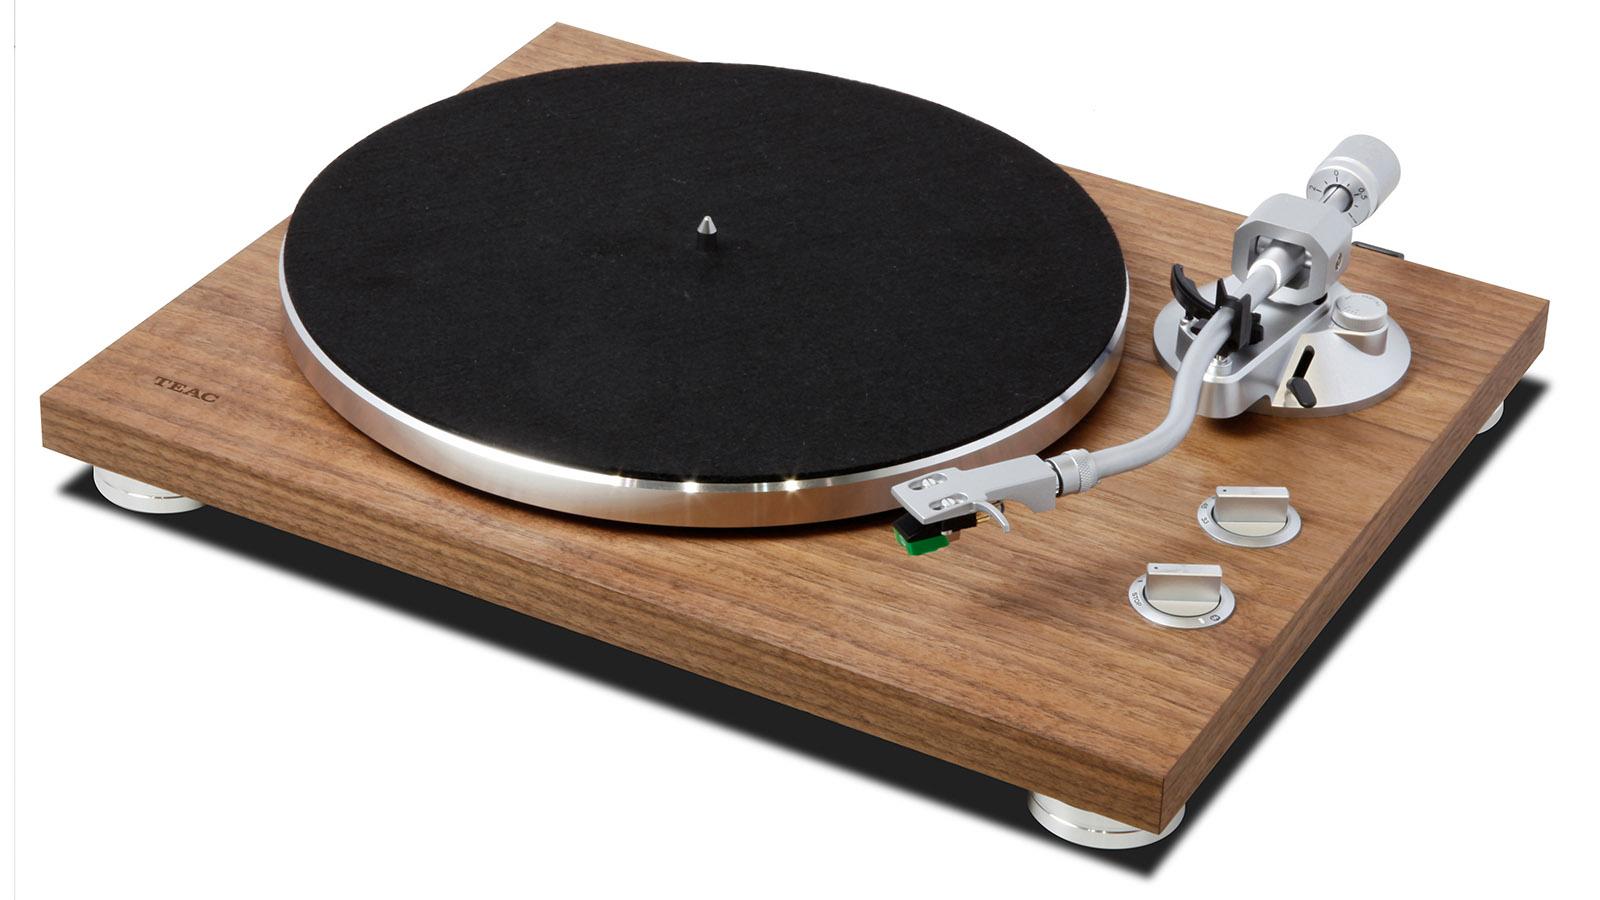 TEAC  黑膠 播放器 類比唱盤 Turntable 台灣公司貨 黑膠唱盤 唱片機 TN-400BT